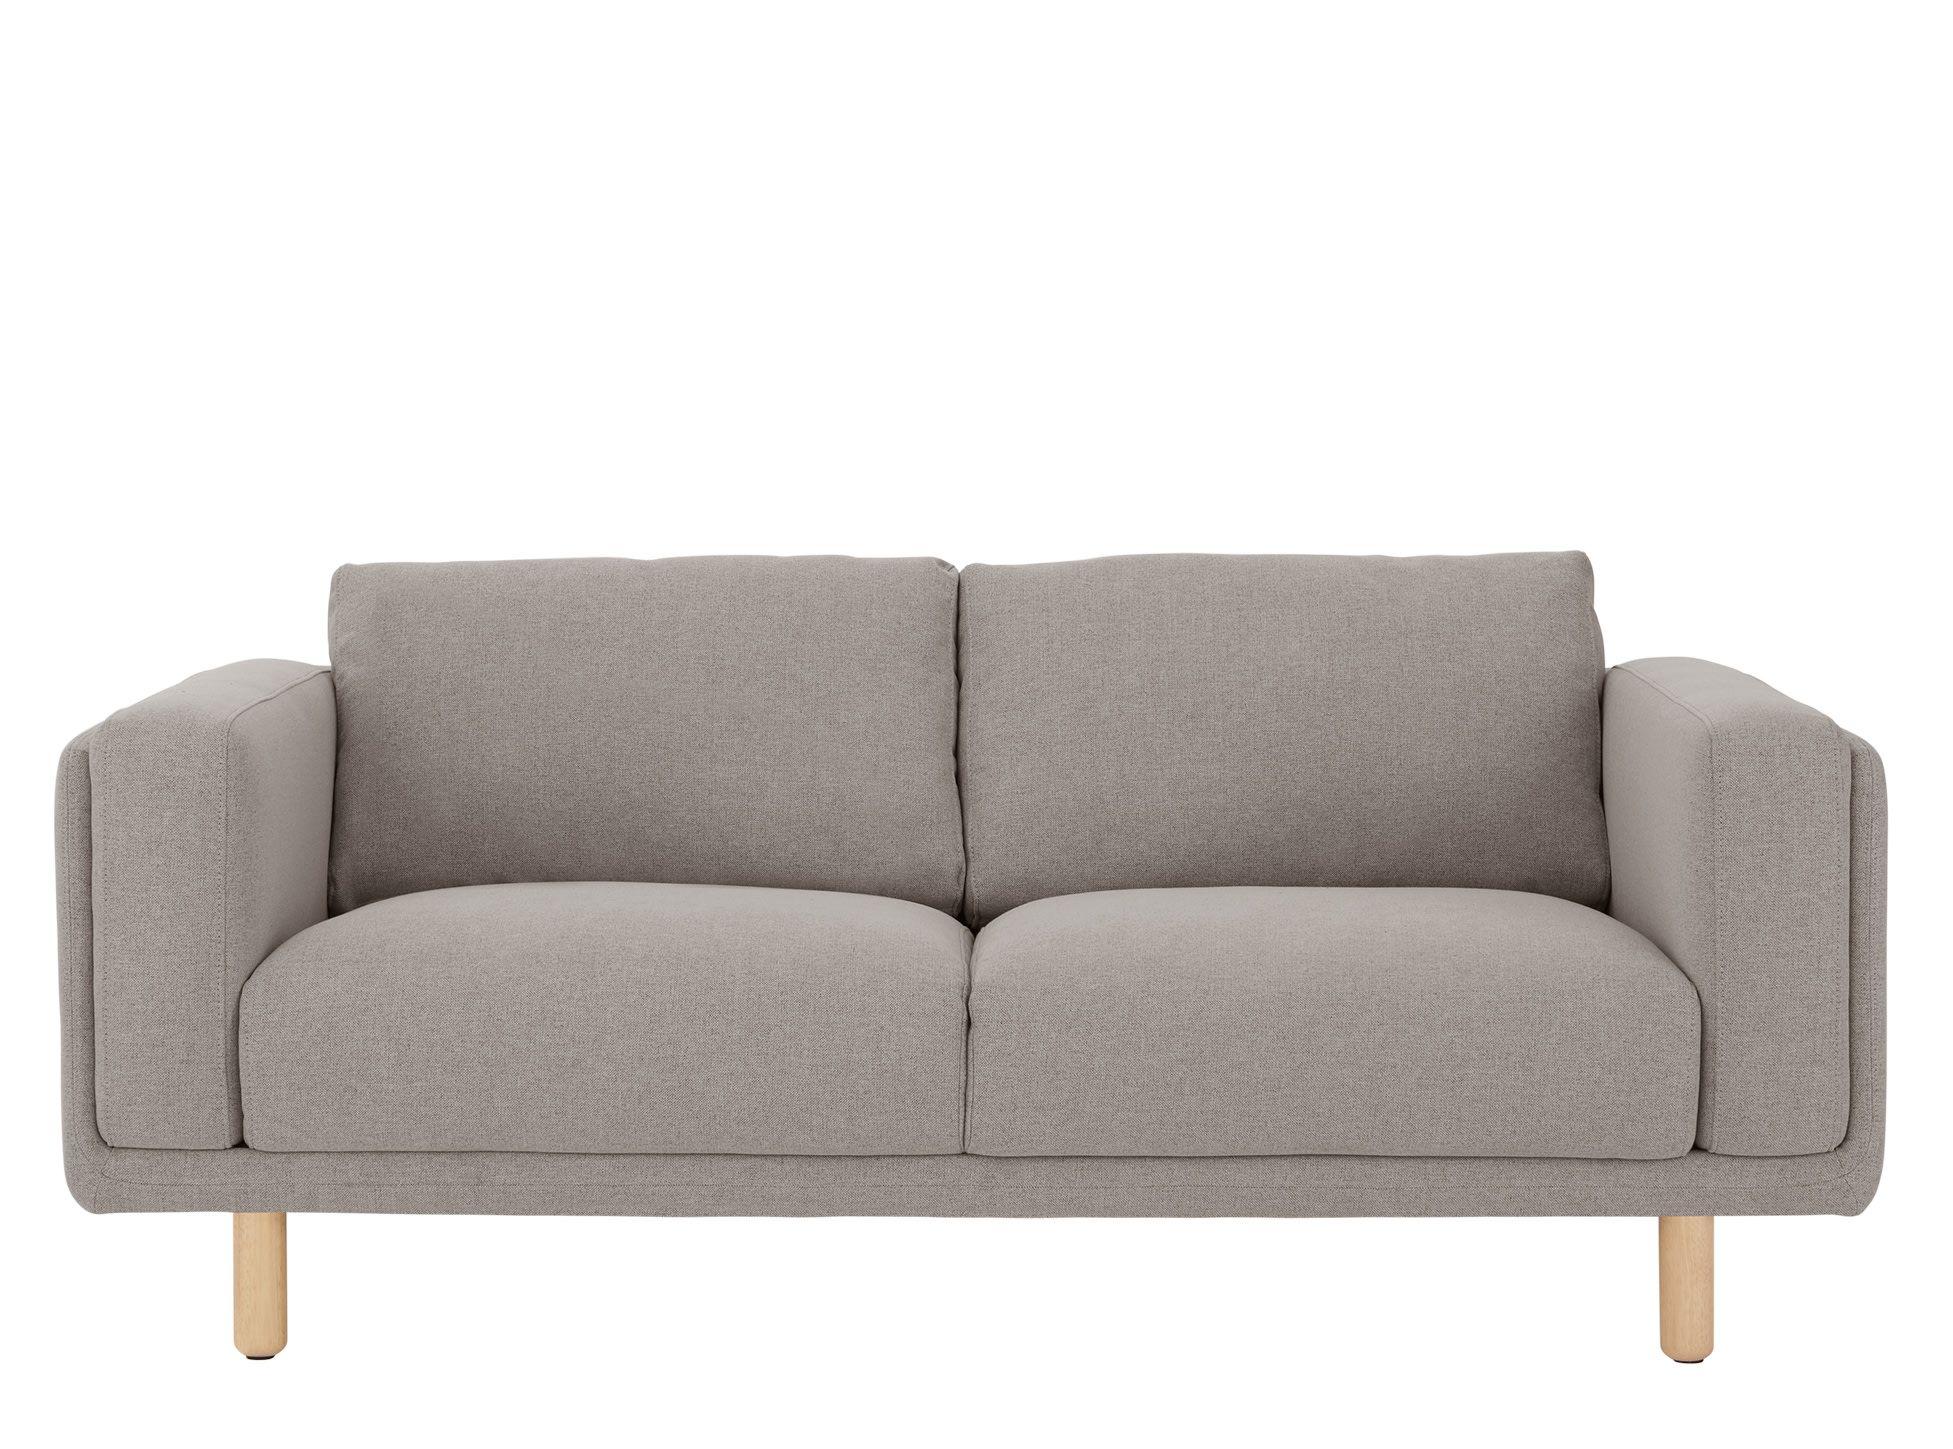 Karson Canape 2 Places Gris Tendre 2 Seater Sofa Sofa Love Seat